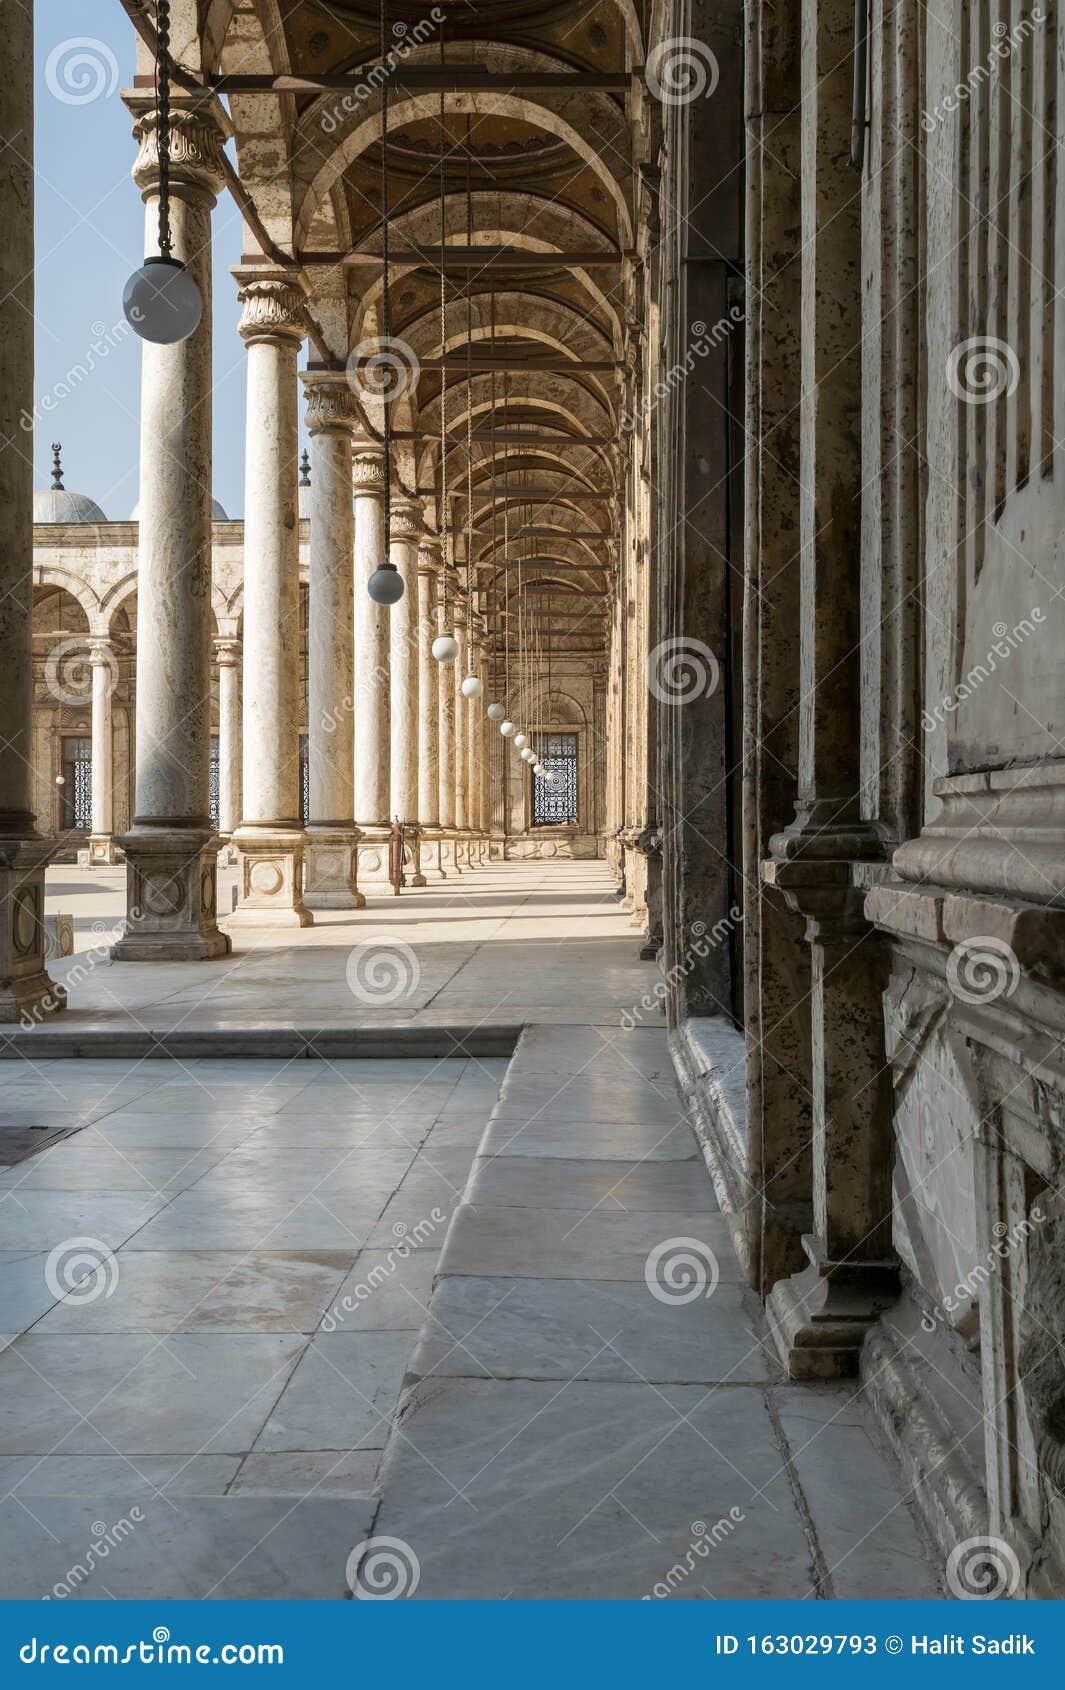 Passages surrounding the court of Muhammad Ali Pasha Mosque, Citadel of Cairo, Egypt